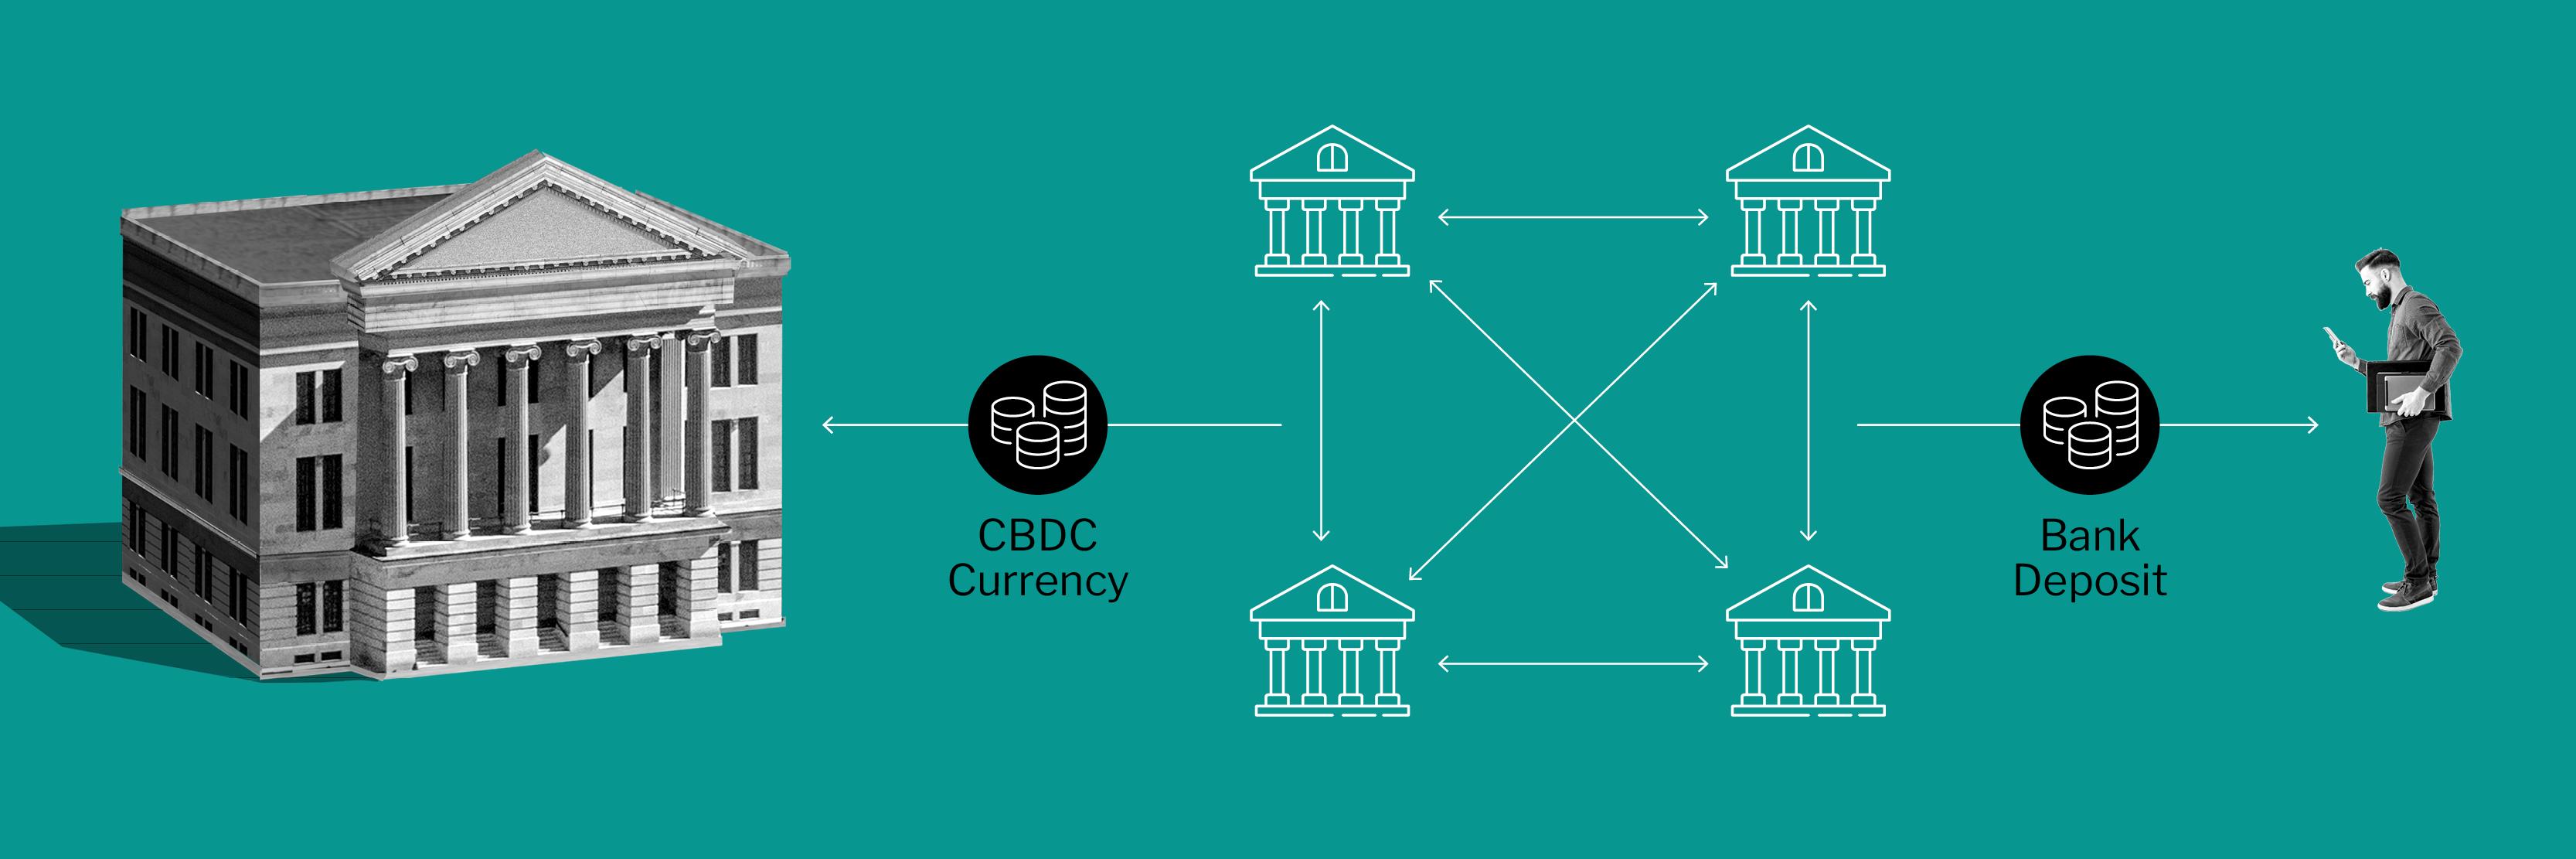 Illustration depicting the wholesale CBDC model